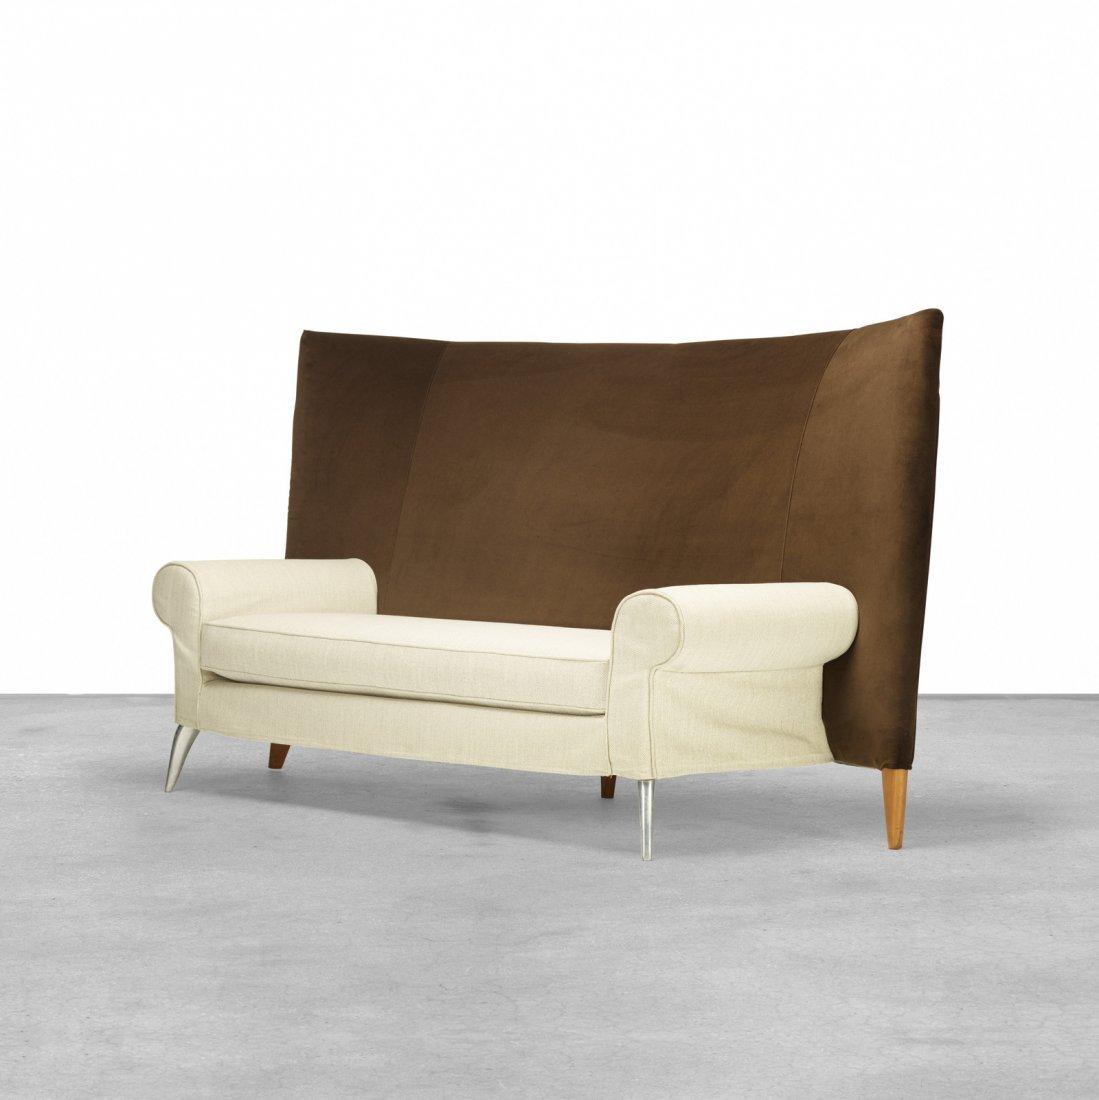 Philippe Starck, Royalton sofa